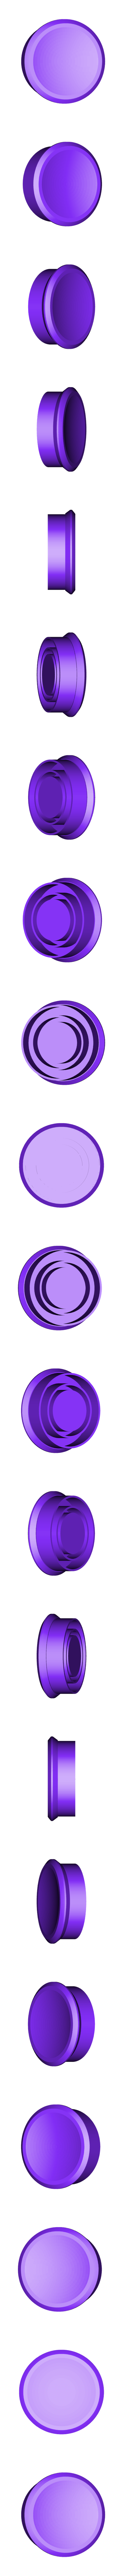 spinner_cap_support_short.stl Download free STL file Slim gear spinner • 3D printer template, bda